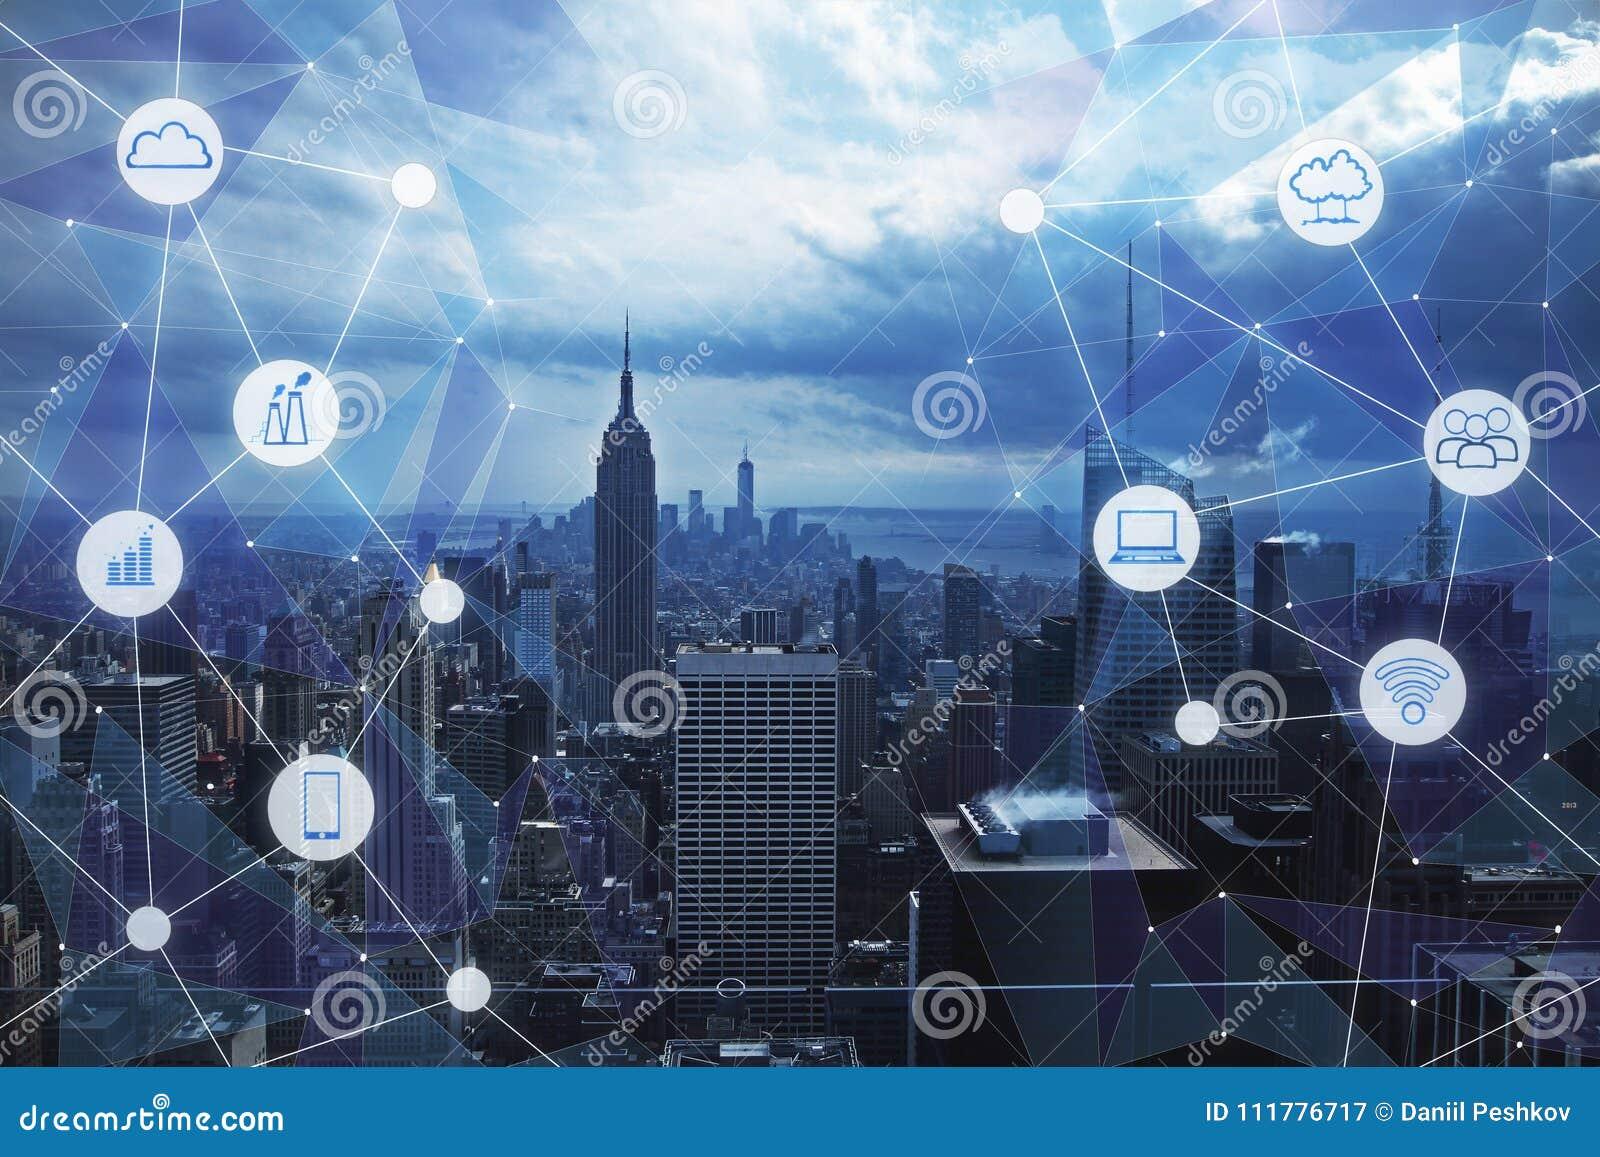 Modern tech city background